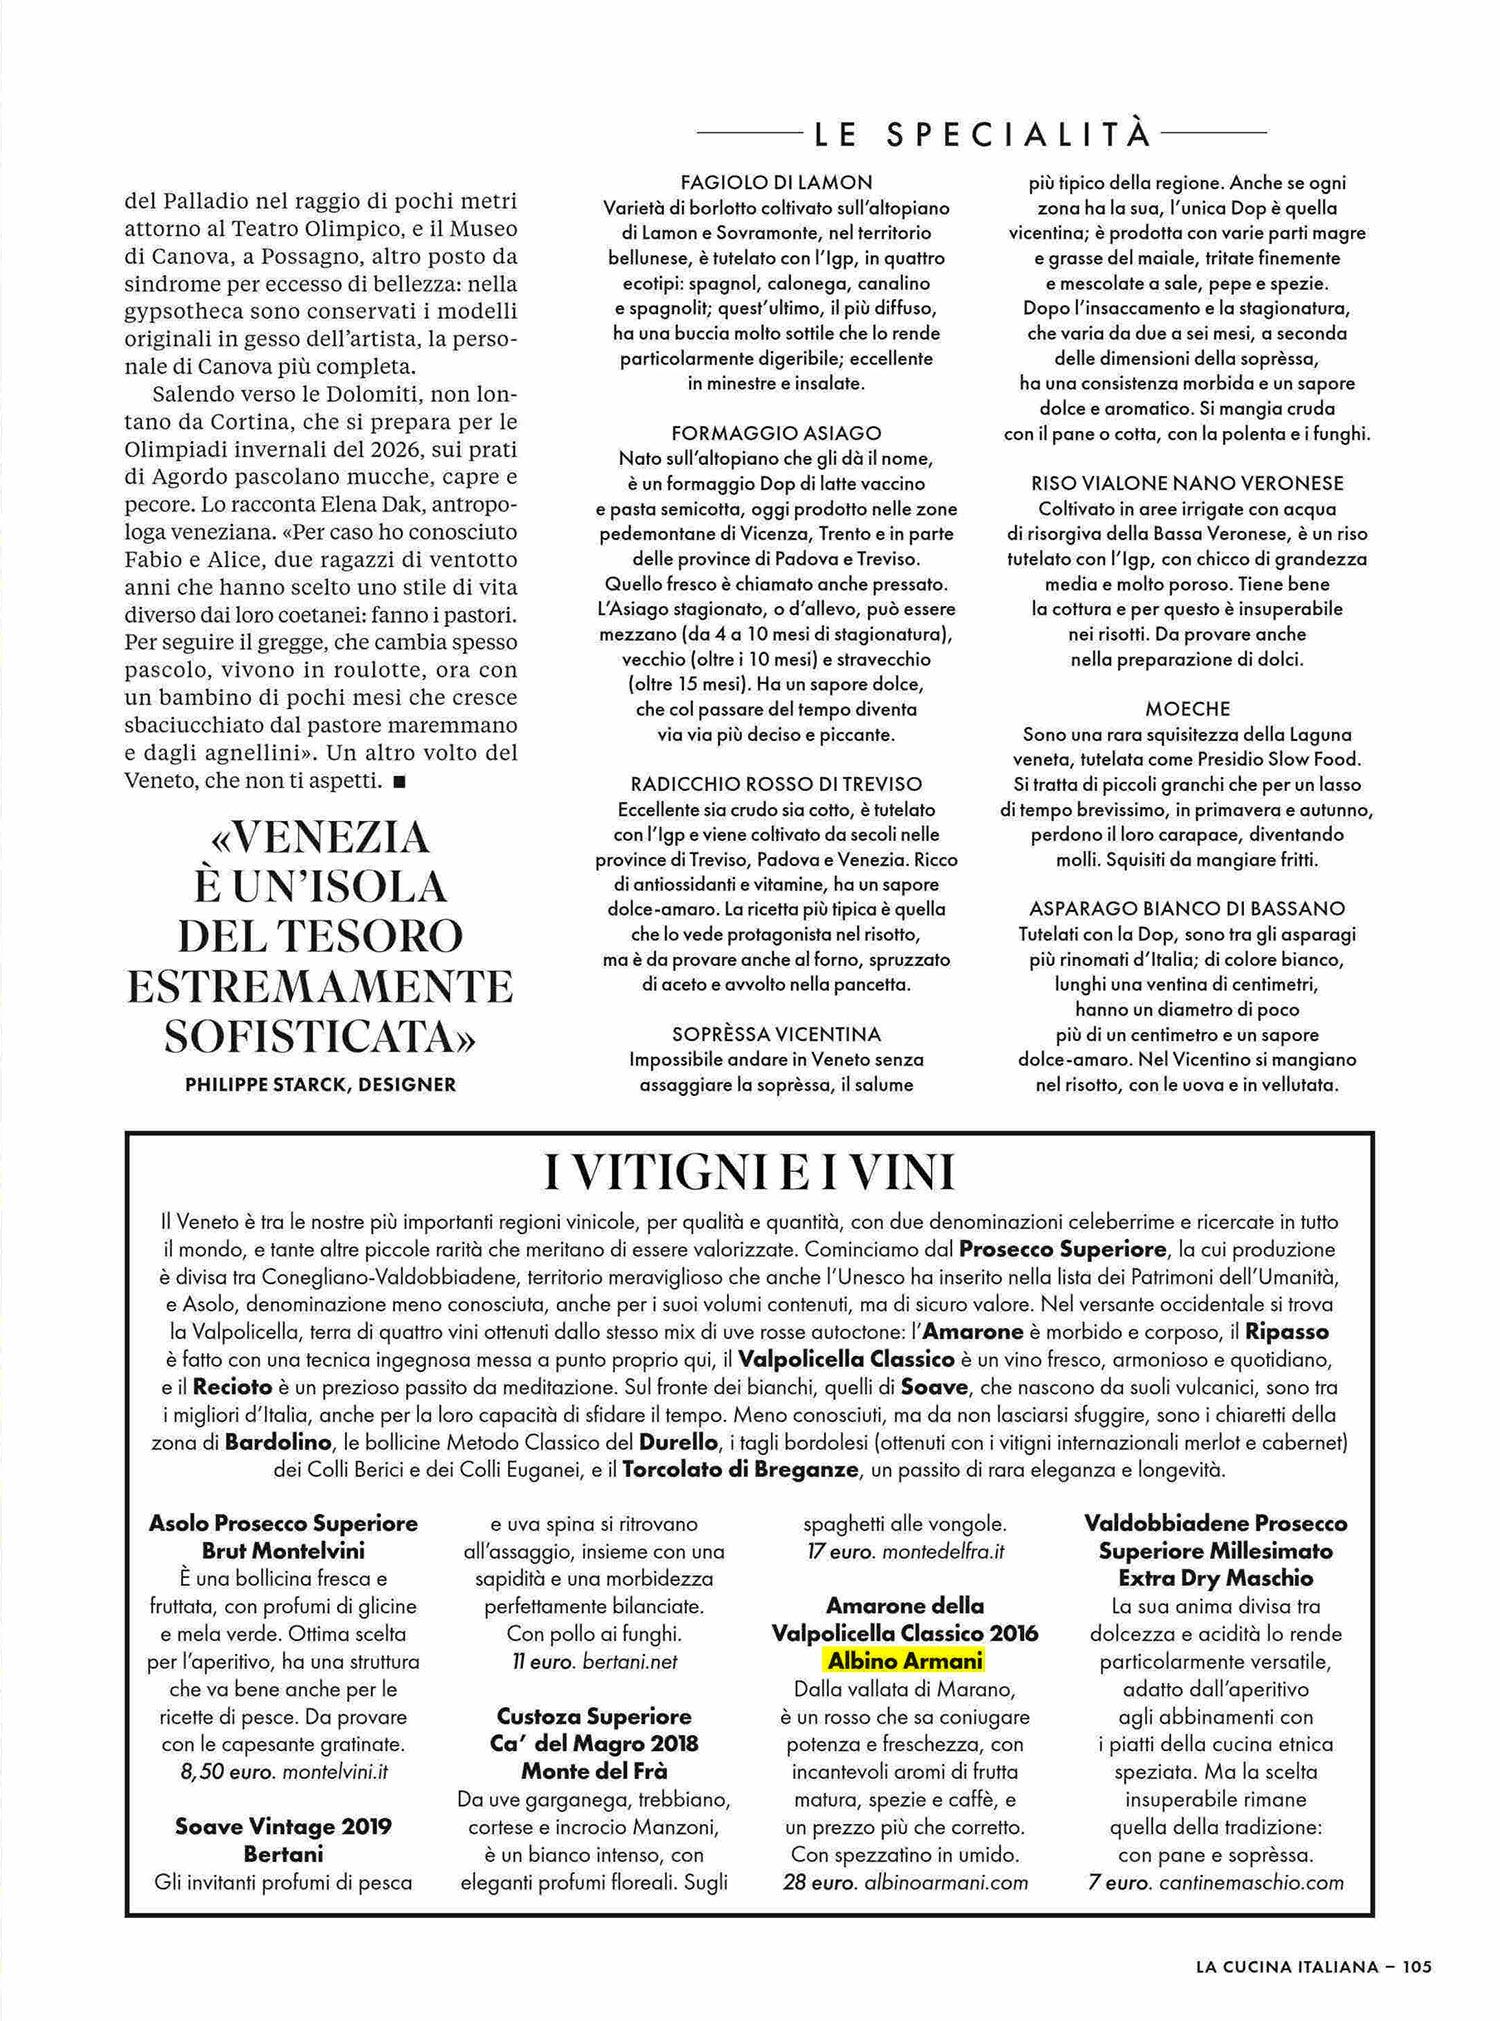 Amarone Albino Armani - La Cucina Italiana